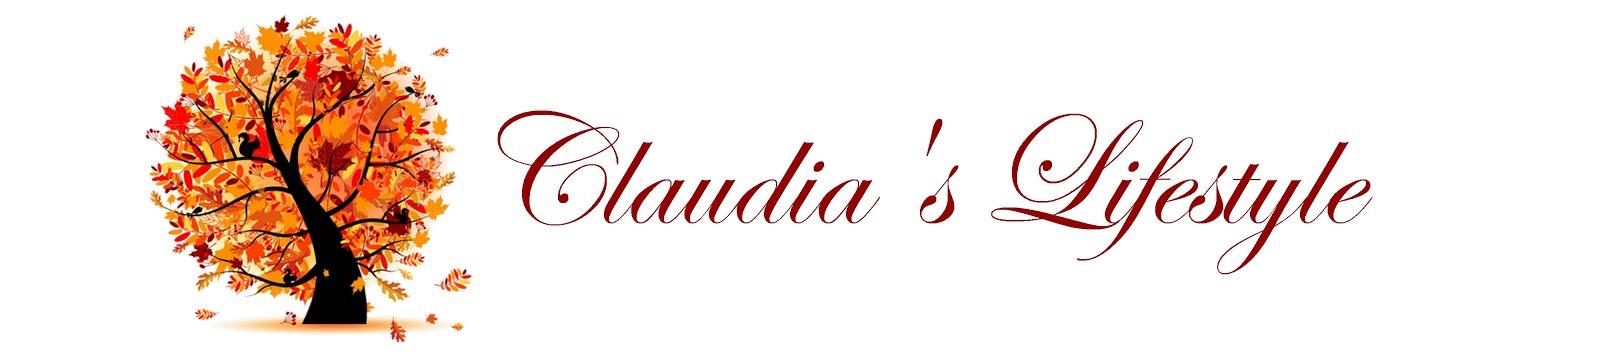 Claudia's Lifestyle